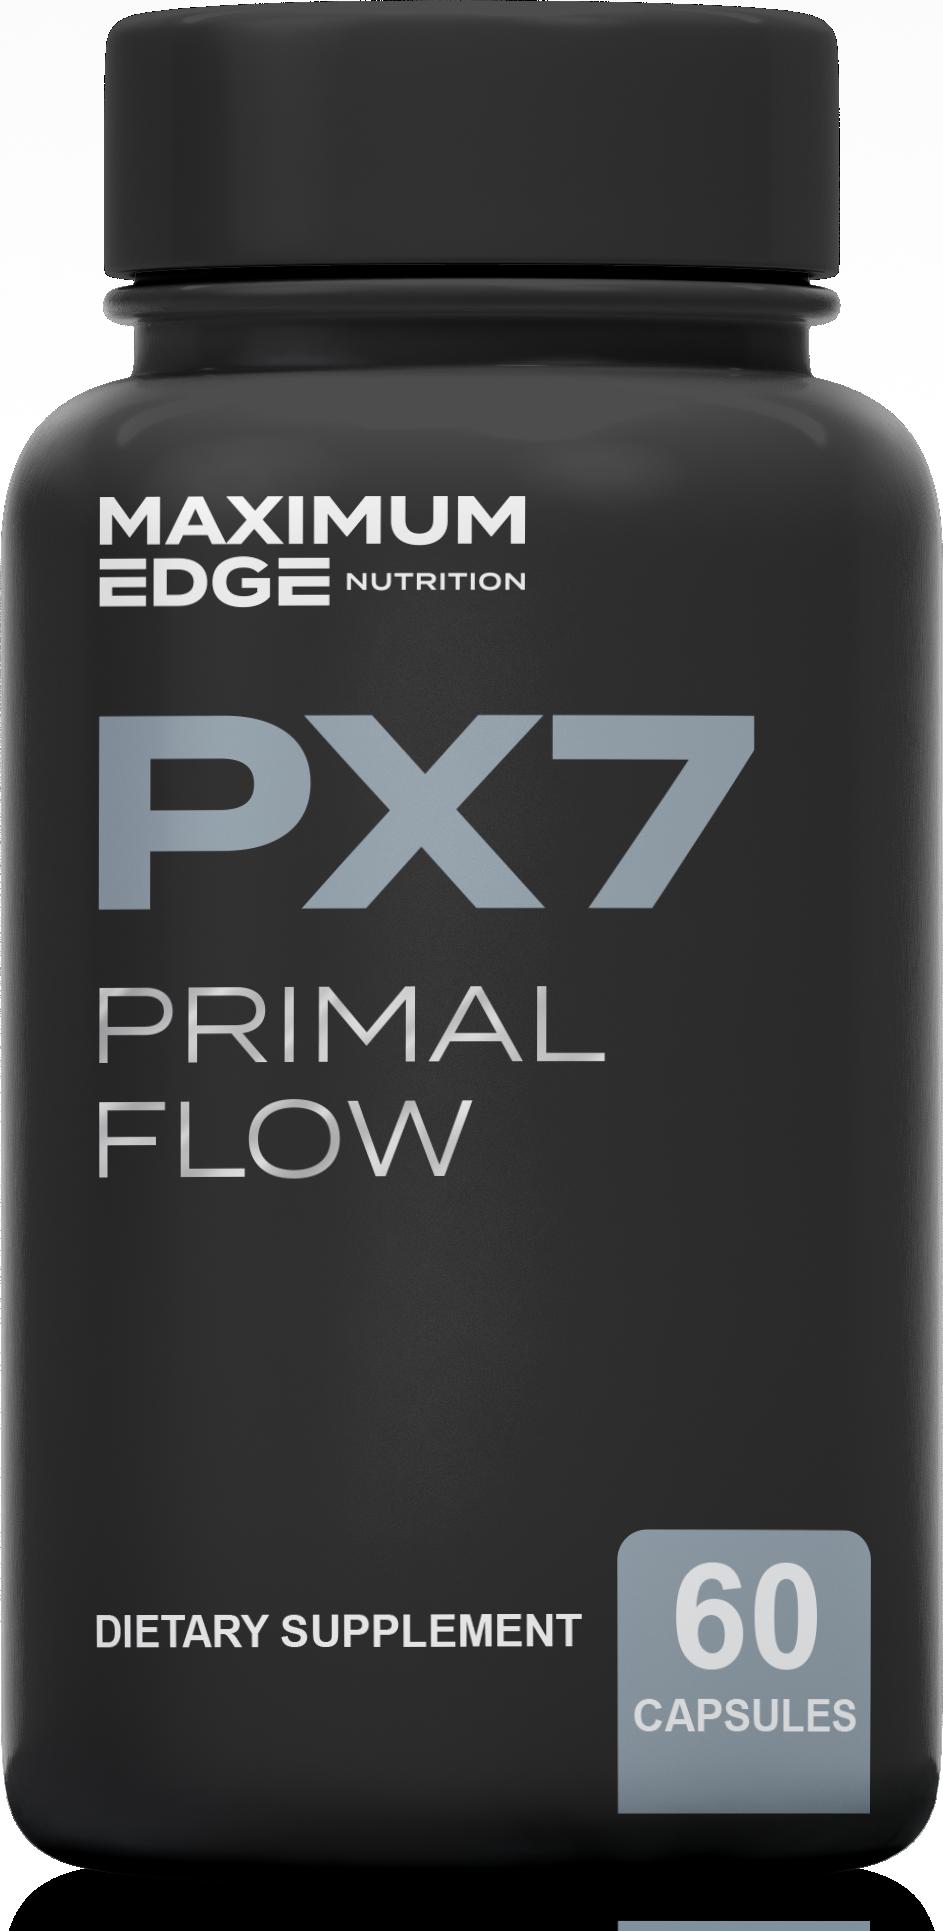 Primal Flow prostate supplement